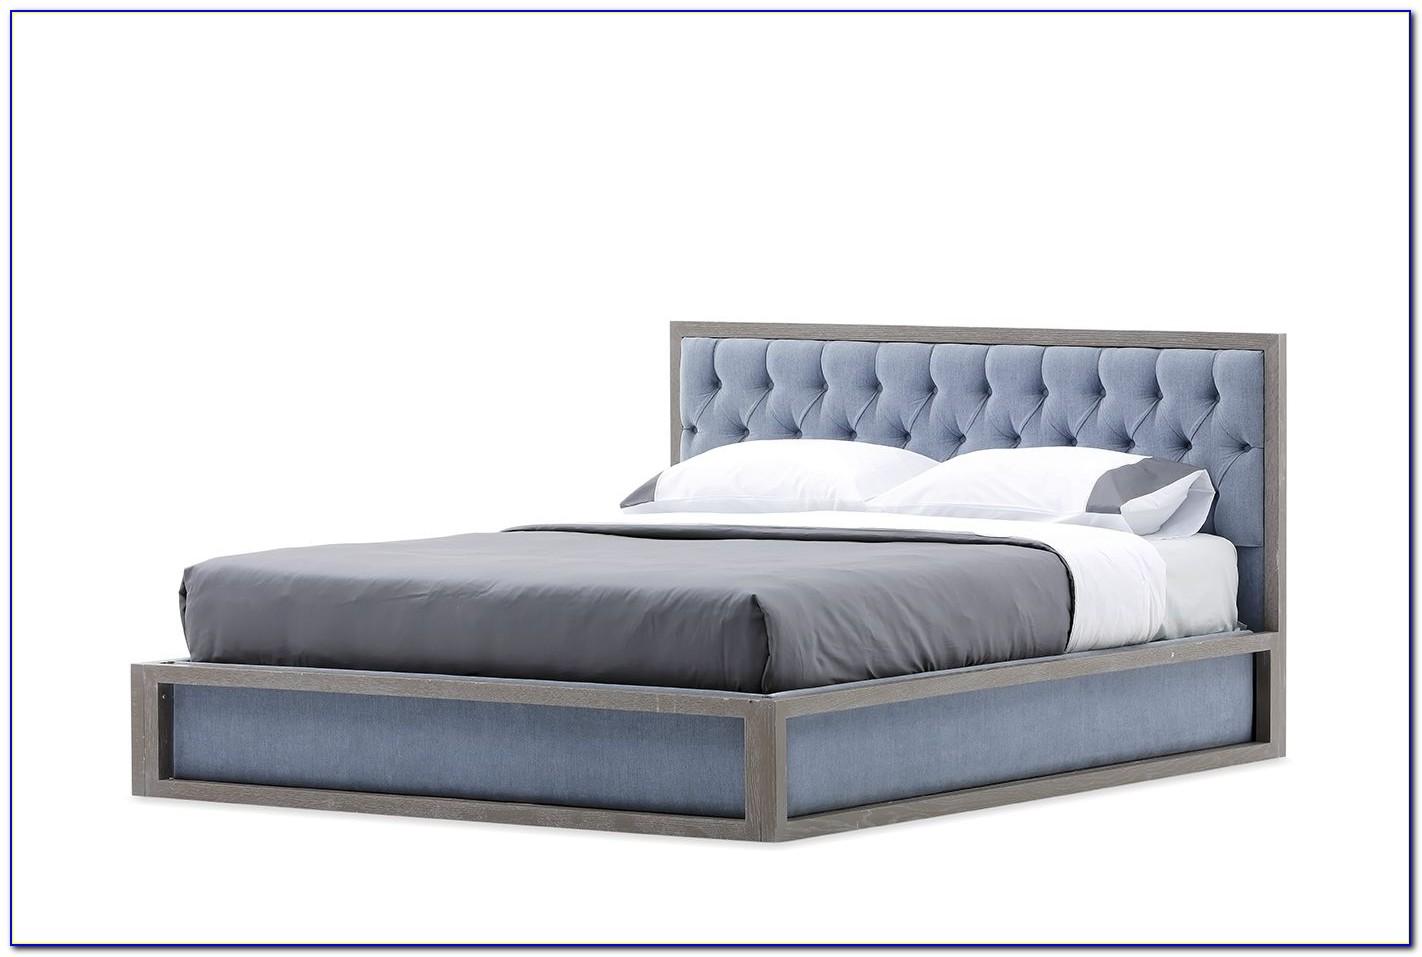 Headboard For Bed Frame